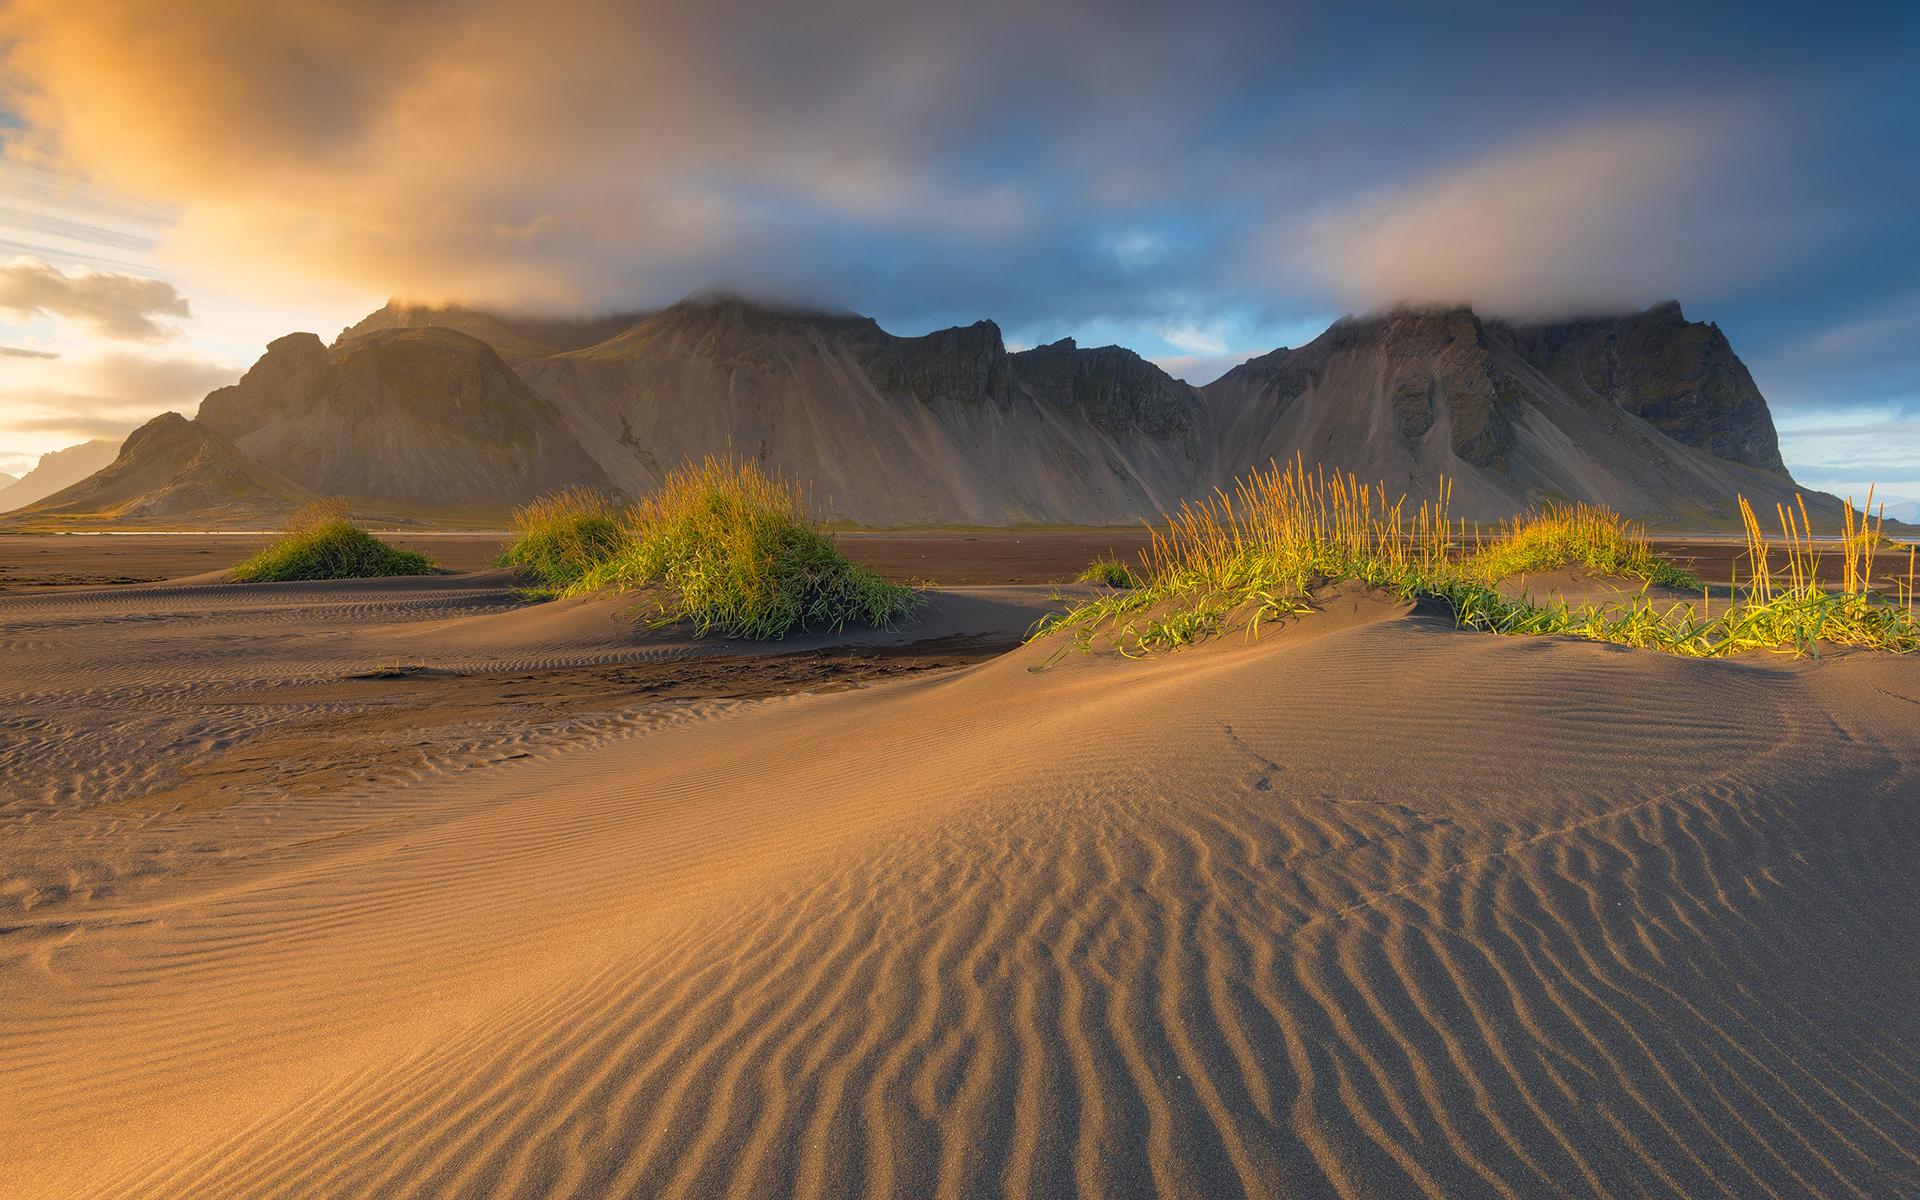 Earth Mountain Rock Cloud Sand Beach 1920x1200